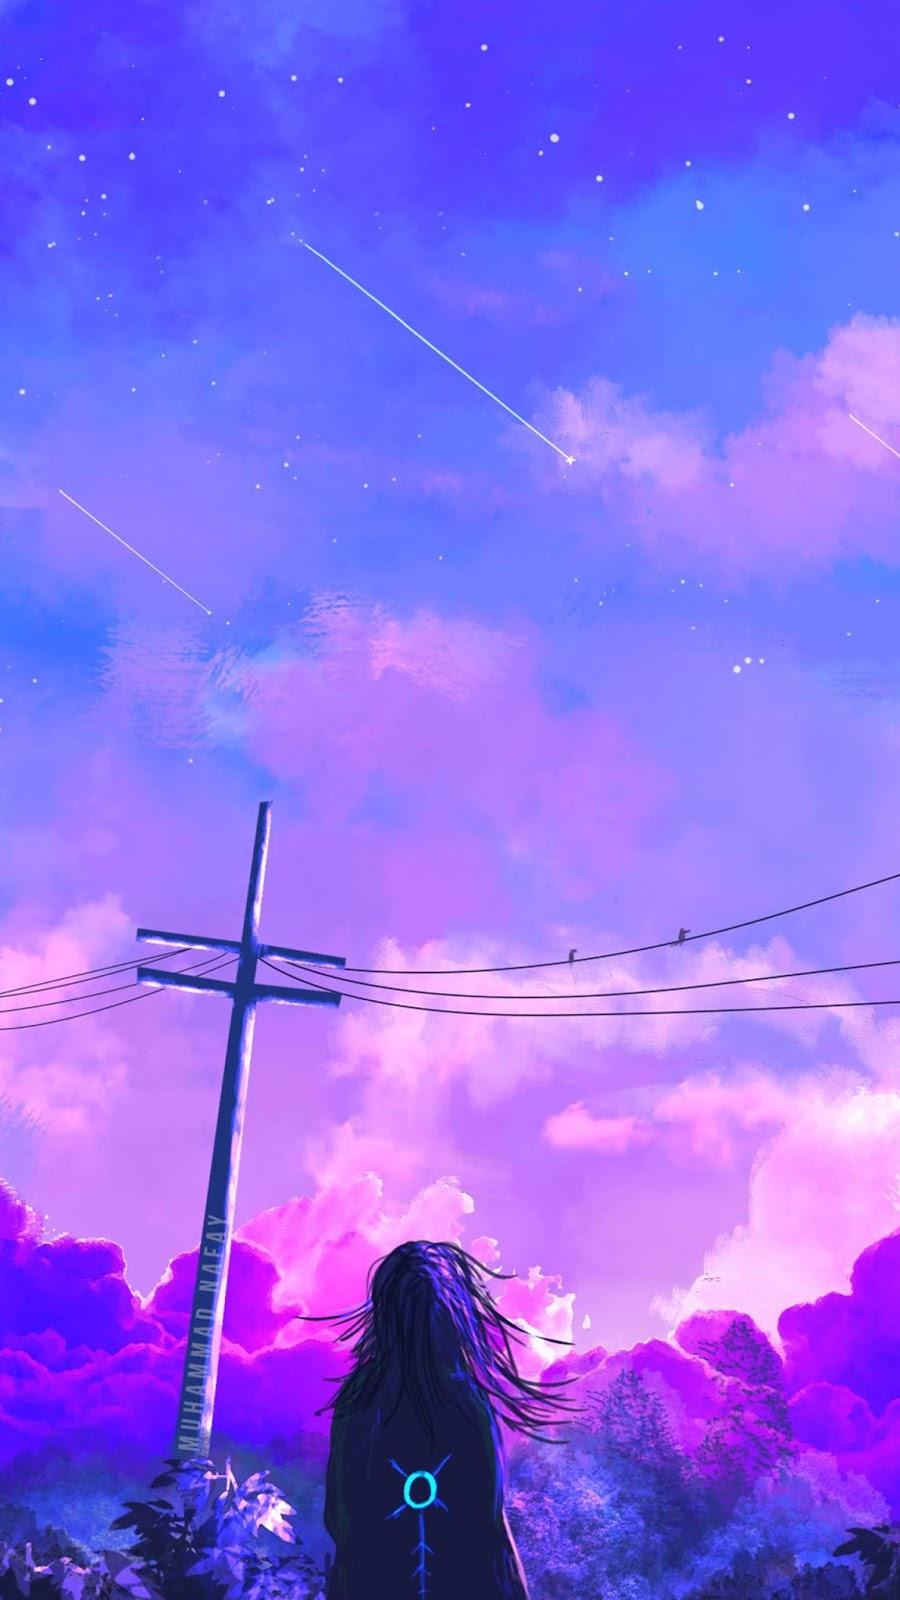 Aesthetic twilight sky